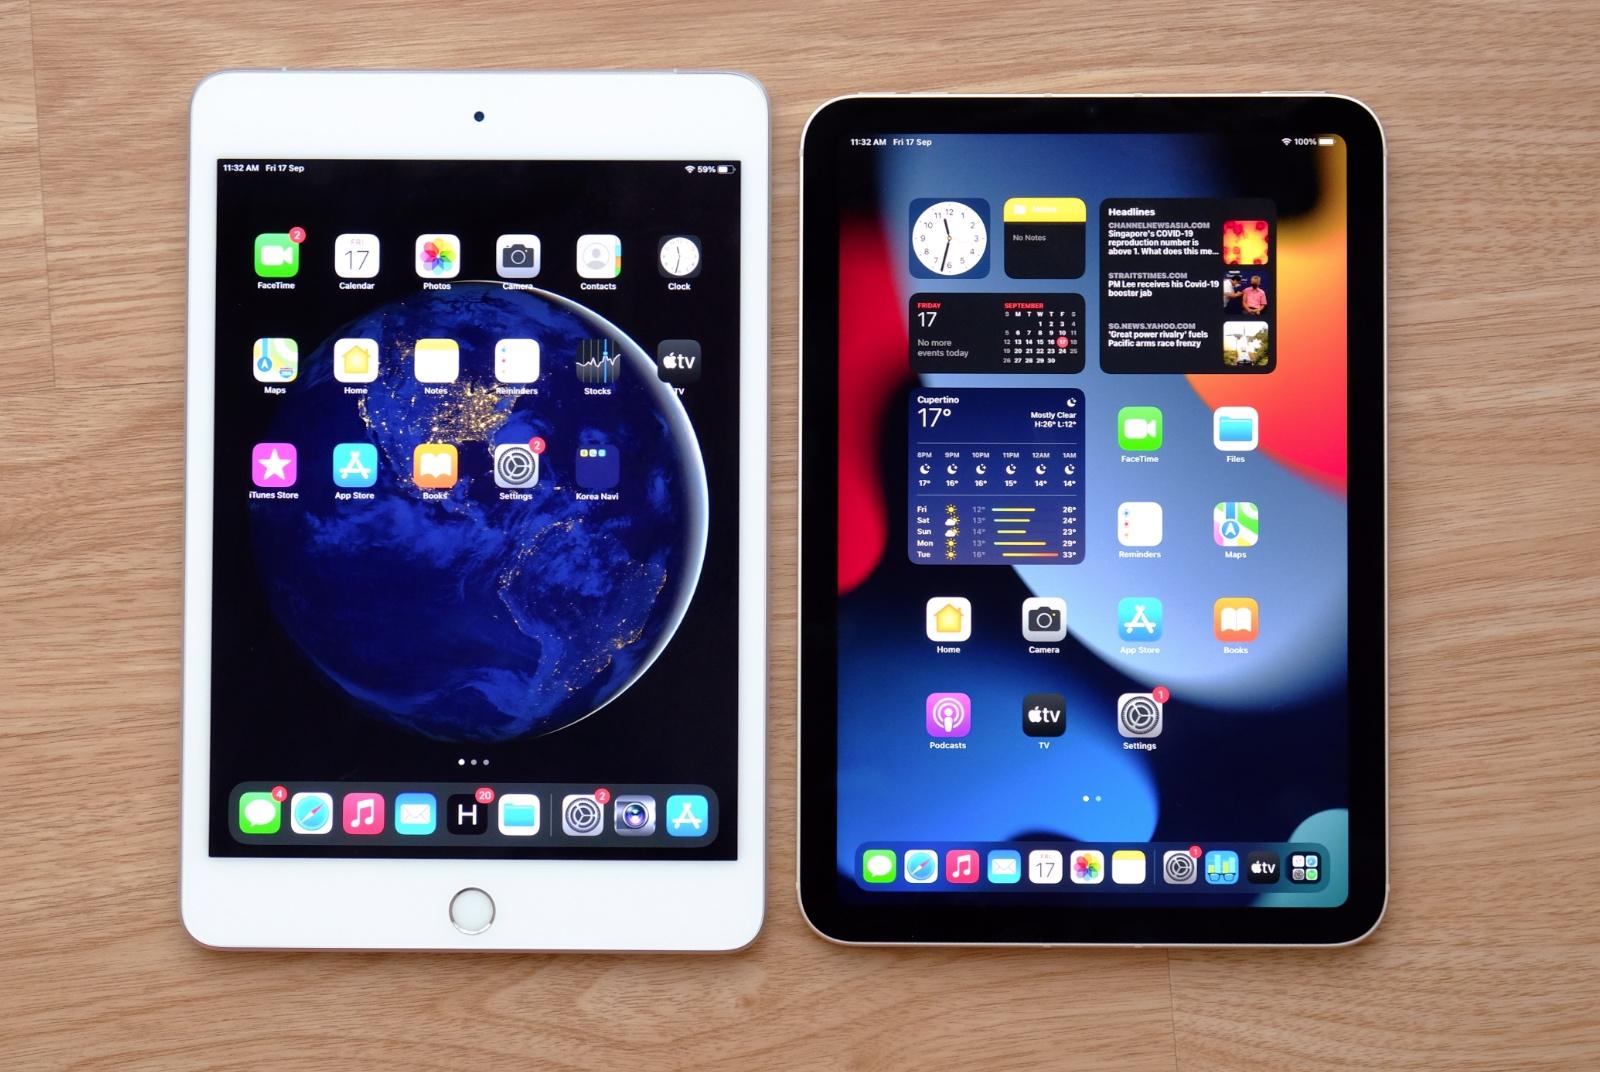 Old iPad Mini on the left, new iPad Mini on the right.